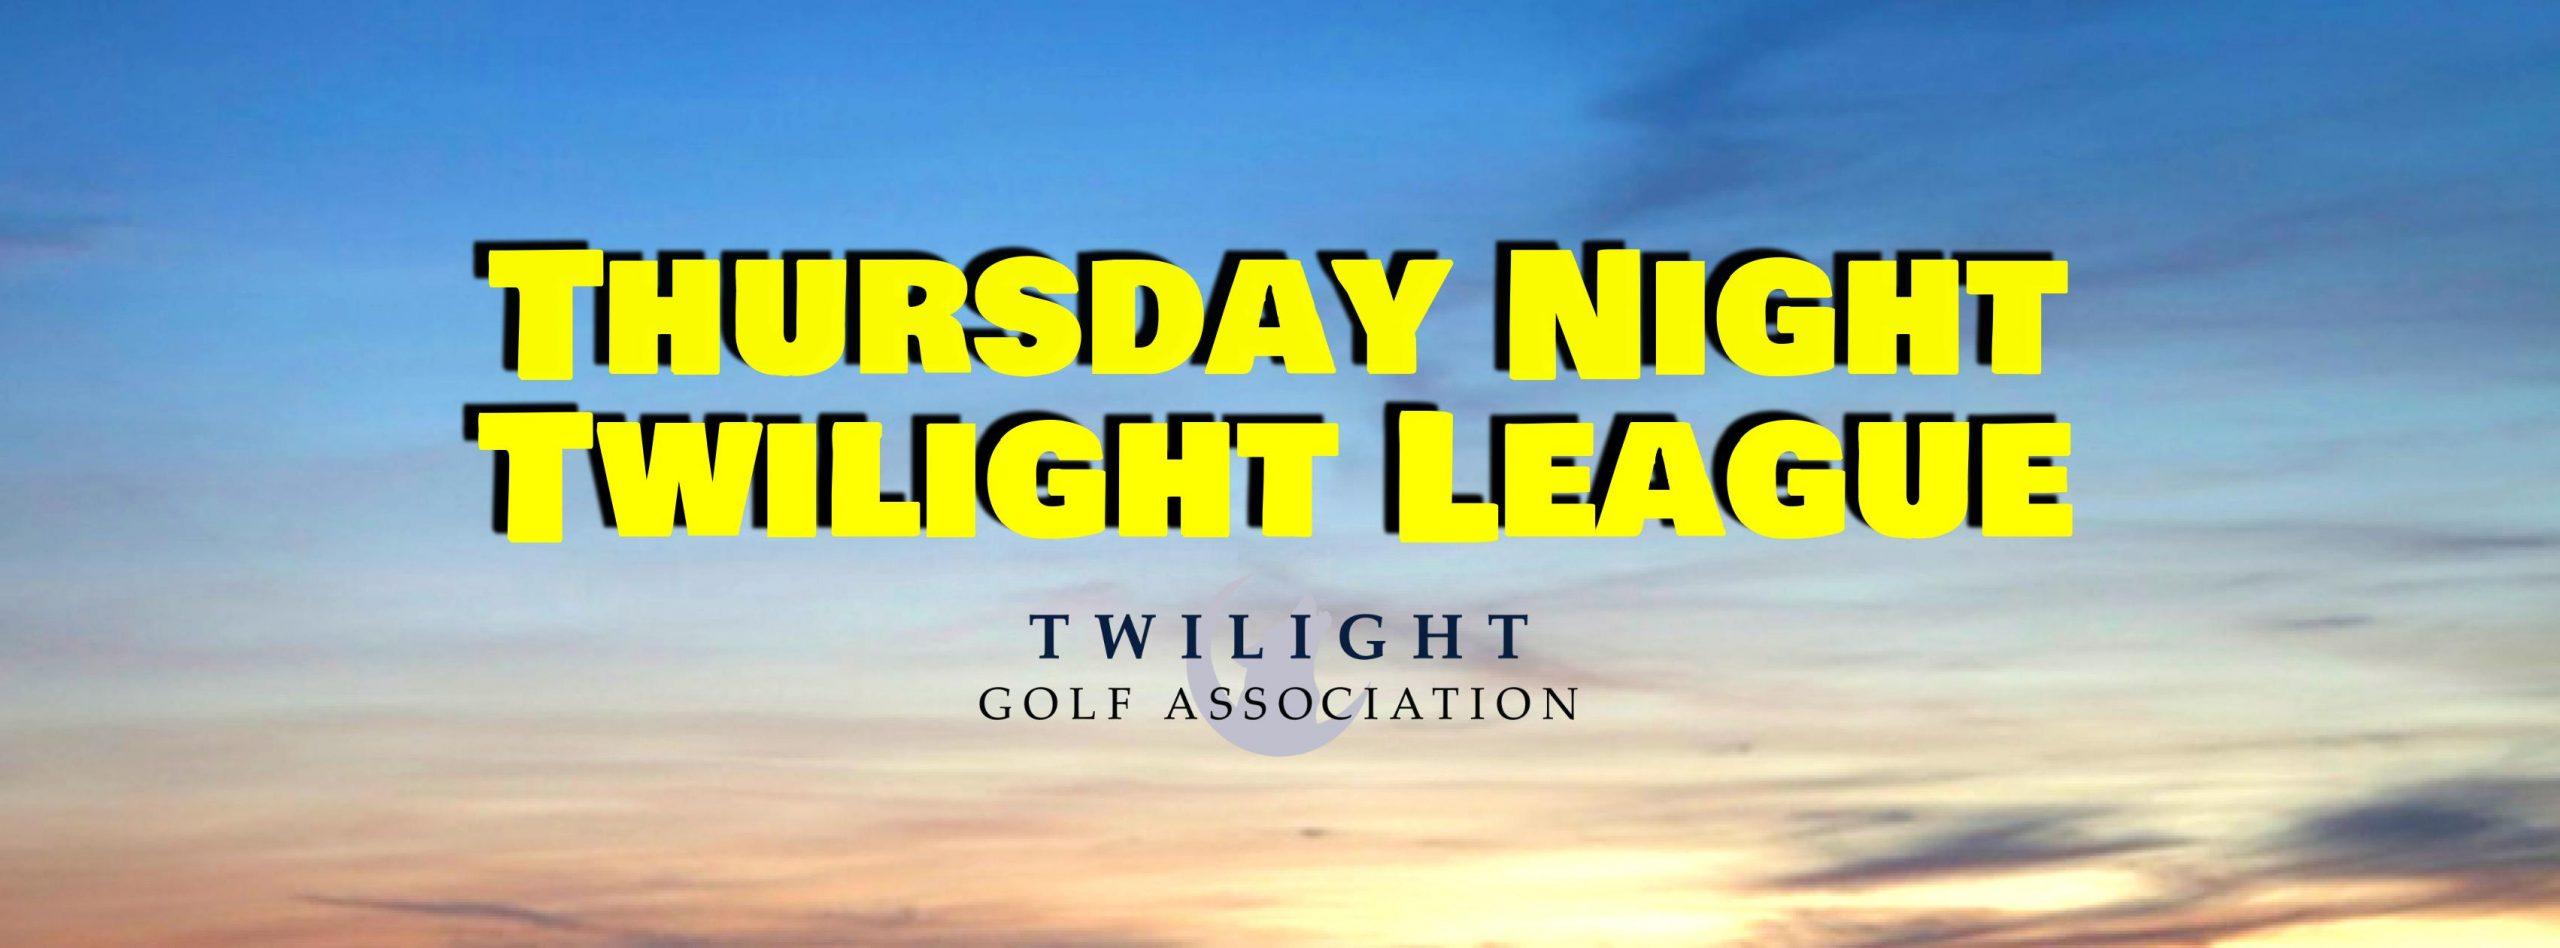 Thursday Night Twilight League at Gambler Ridge Golf Club